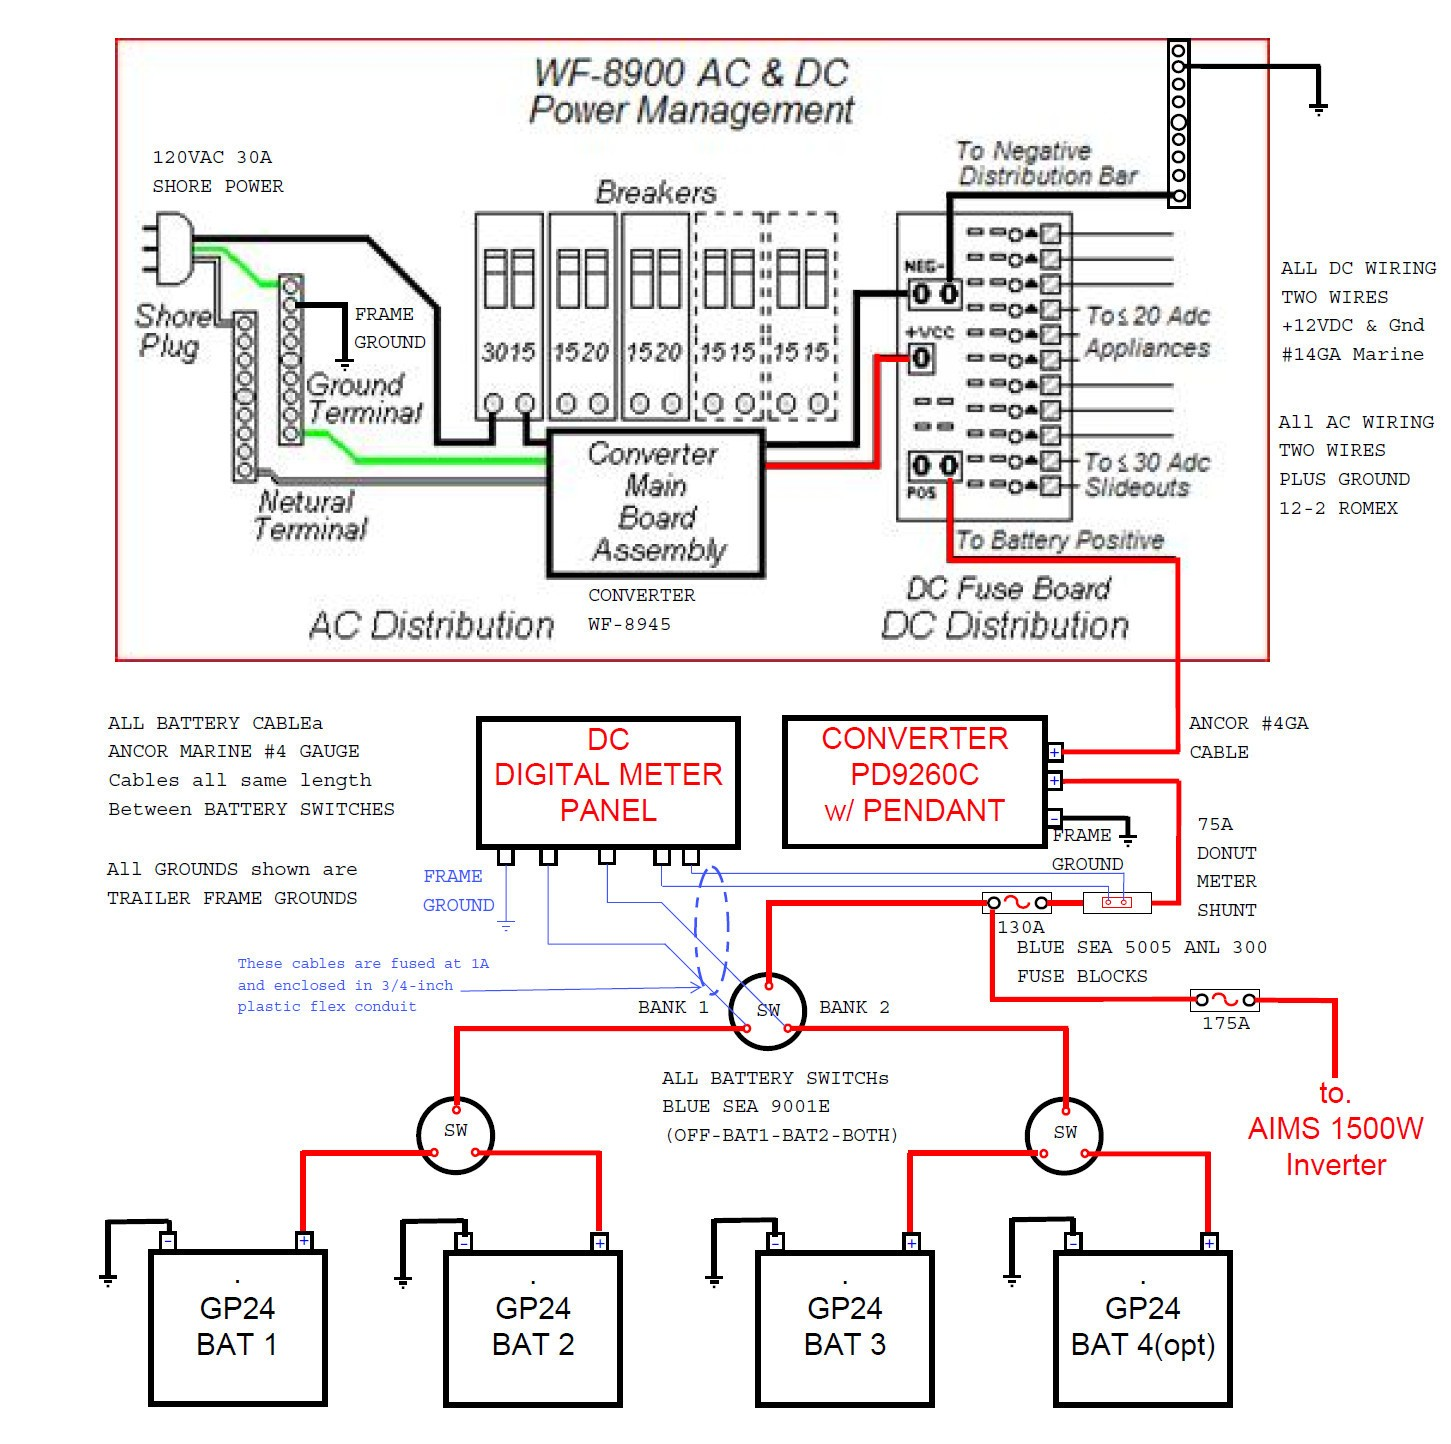 shore power wiring diagram vav controller marine elegant